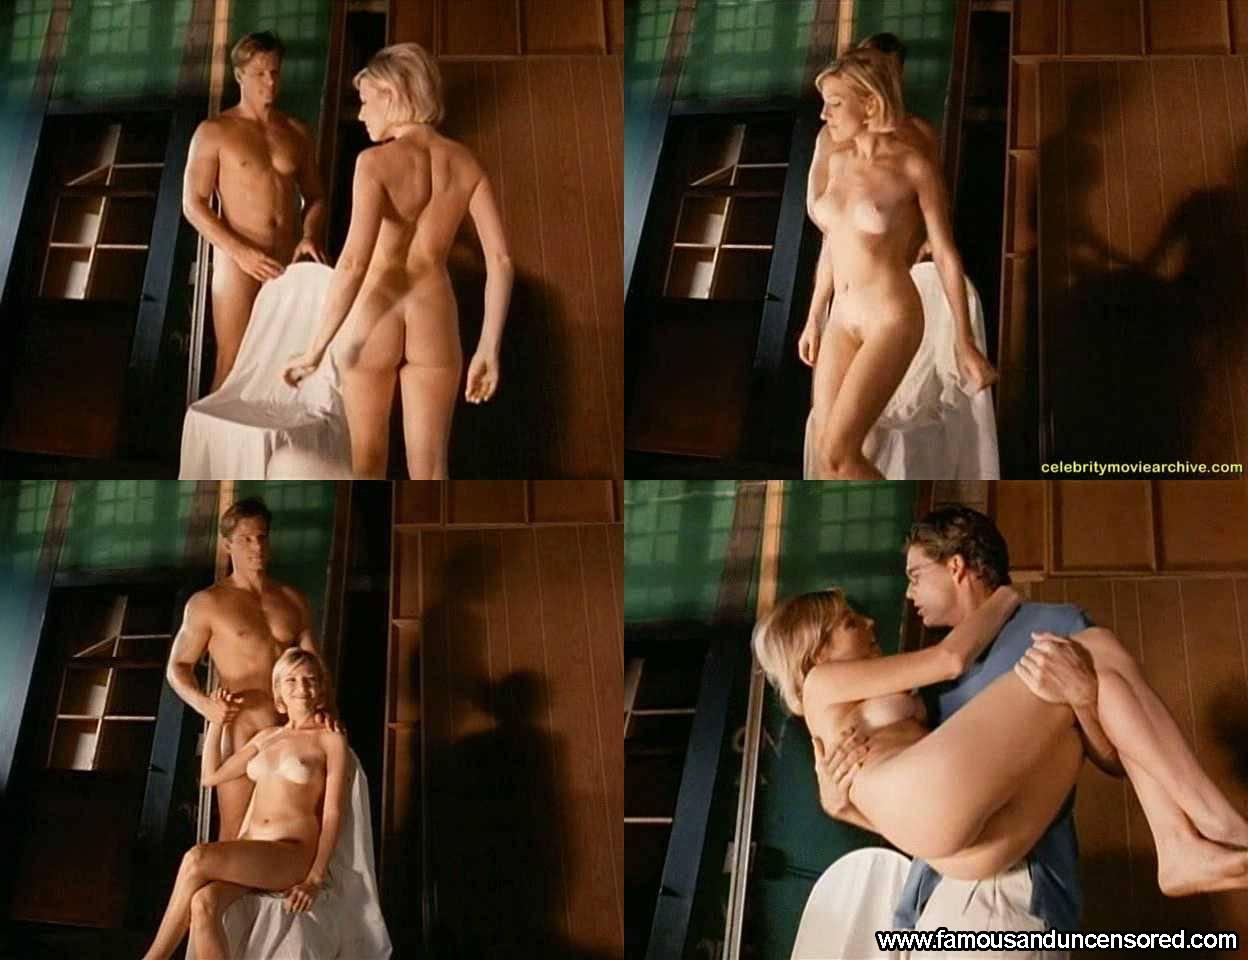 Virtual encounters 2 sex scene